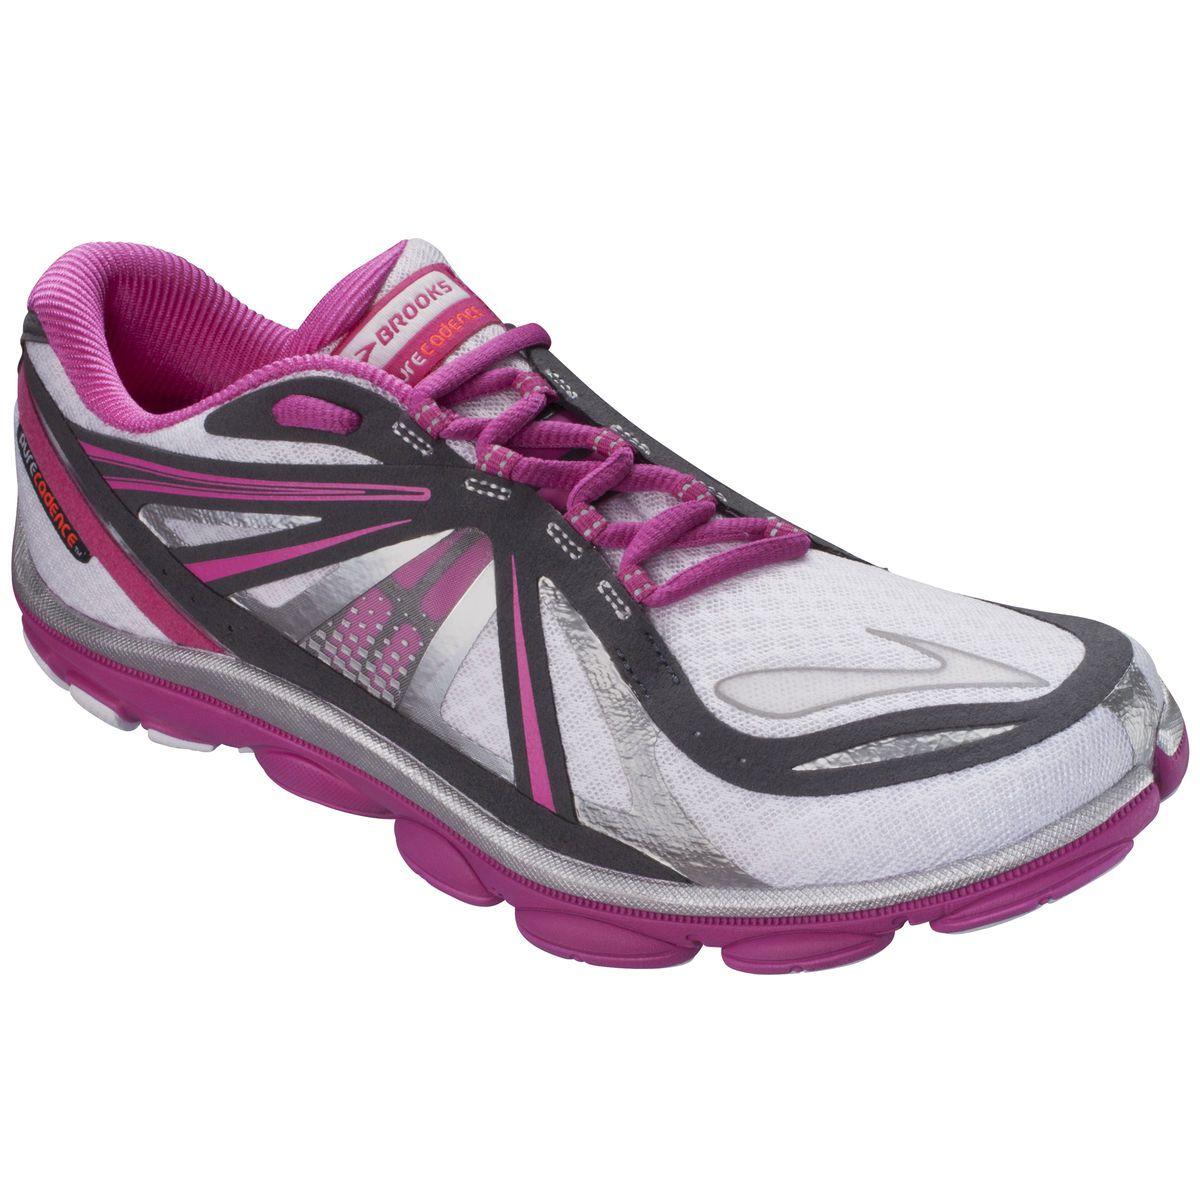 Crane Running Shoes